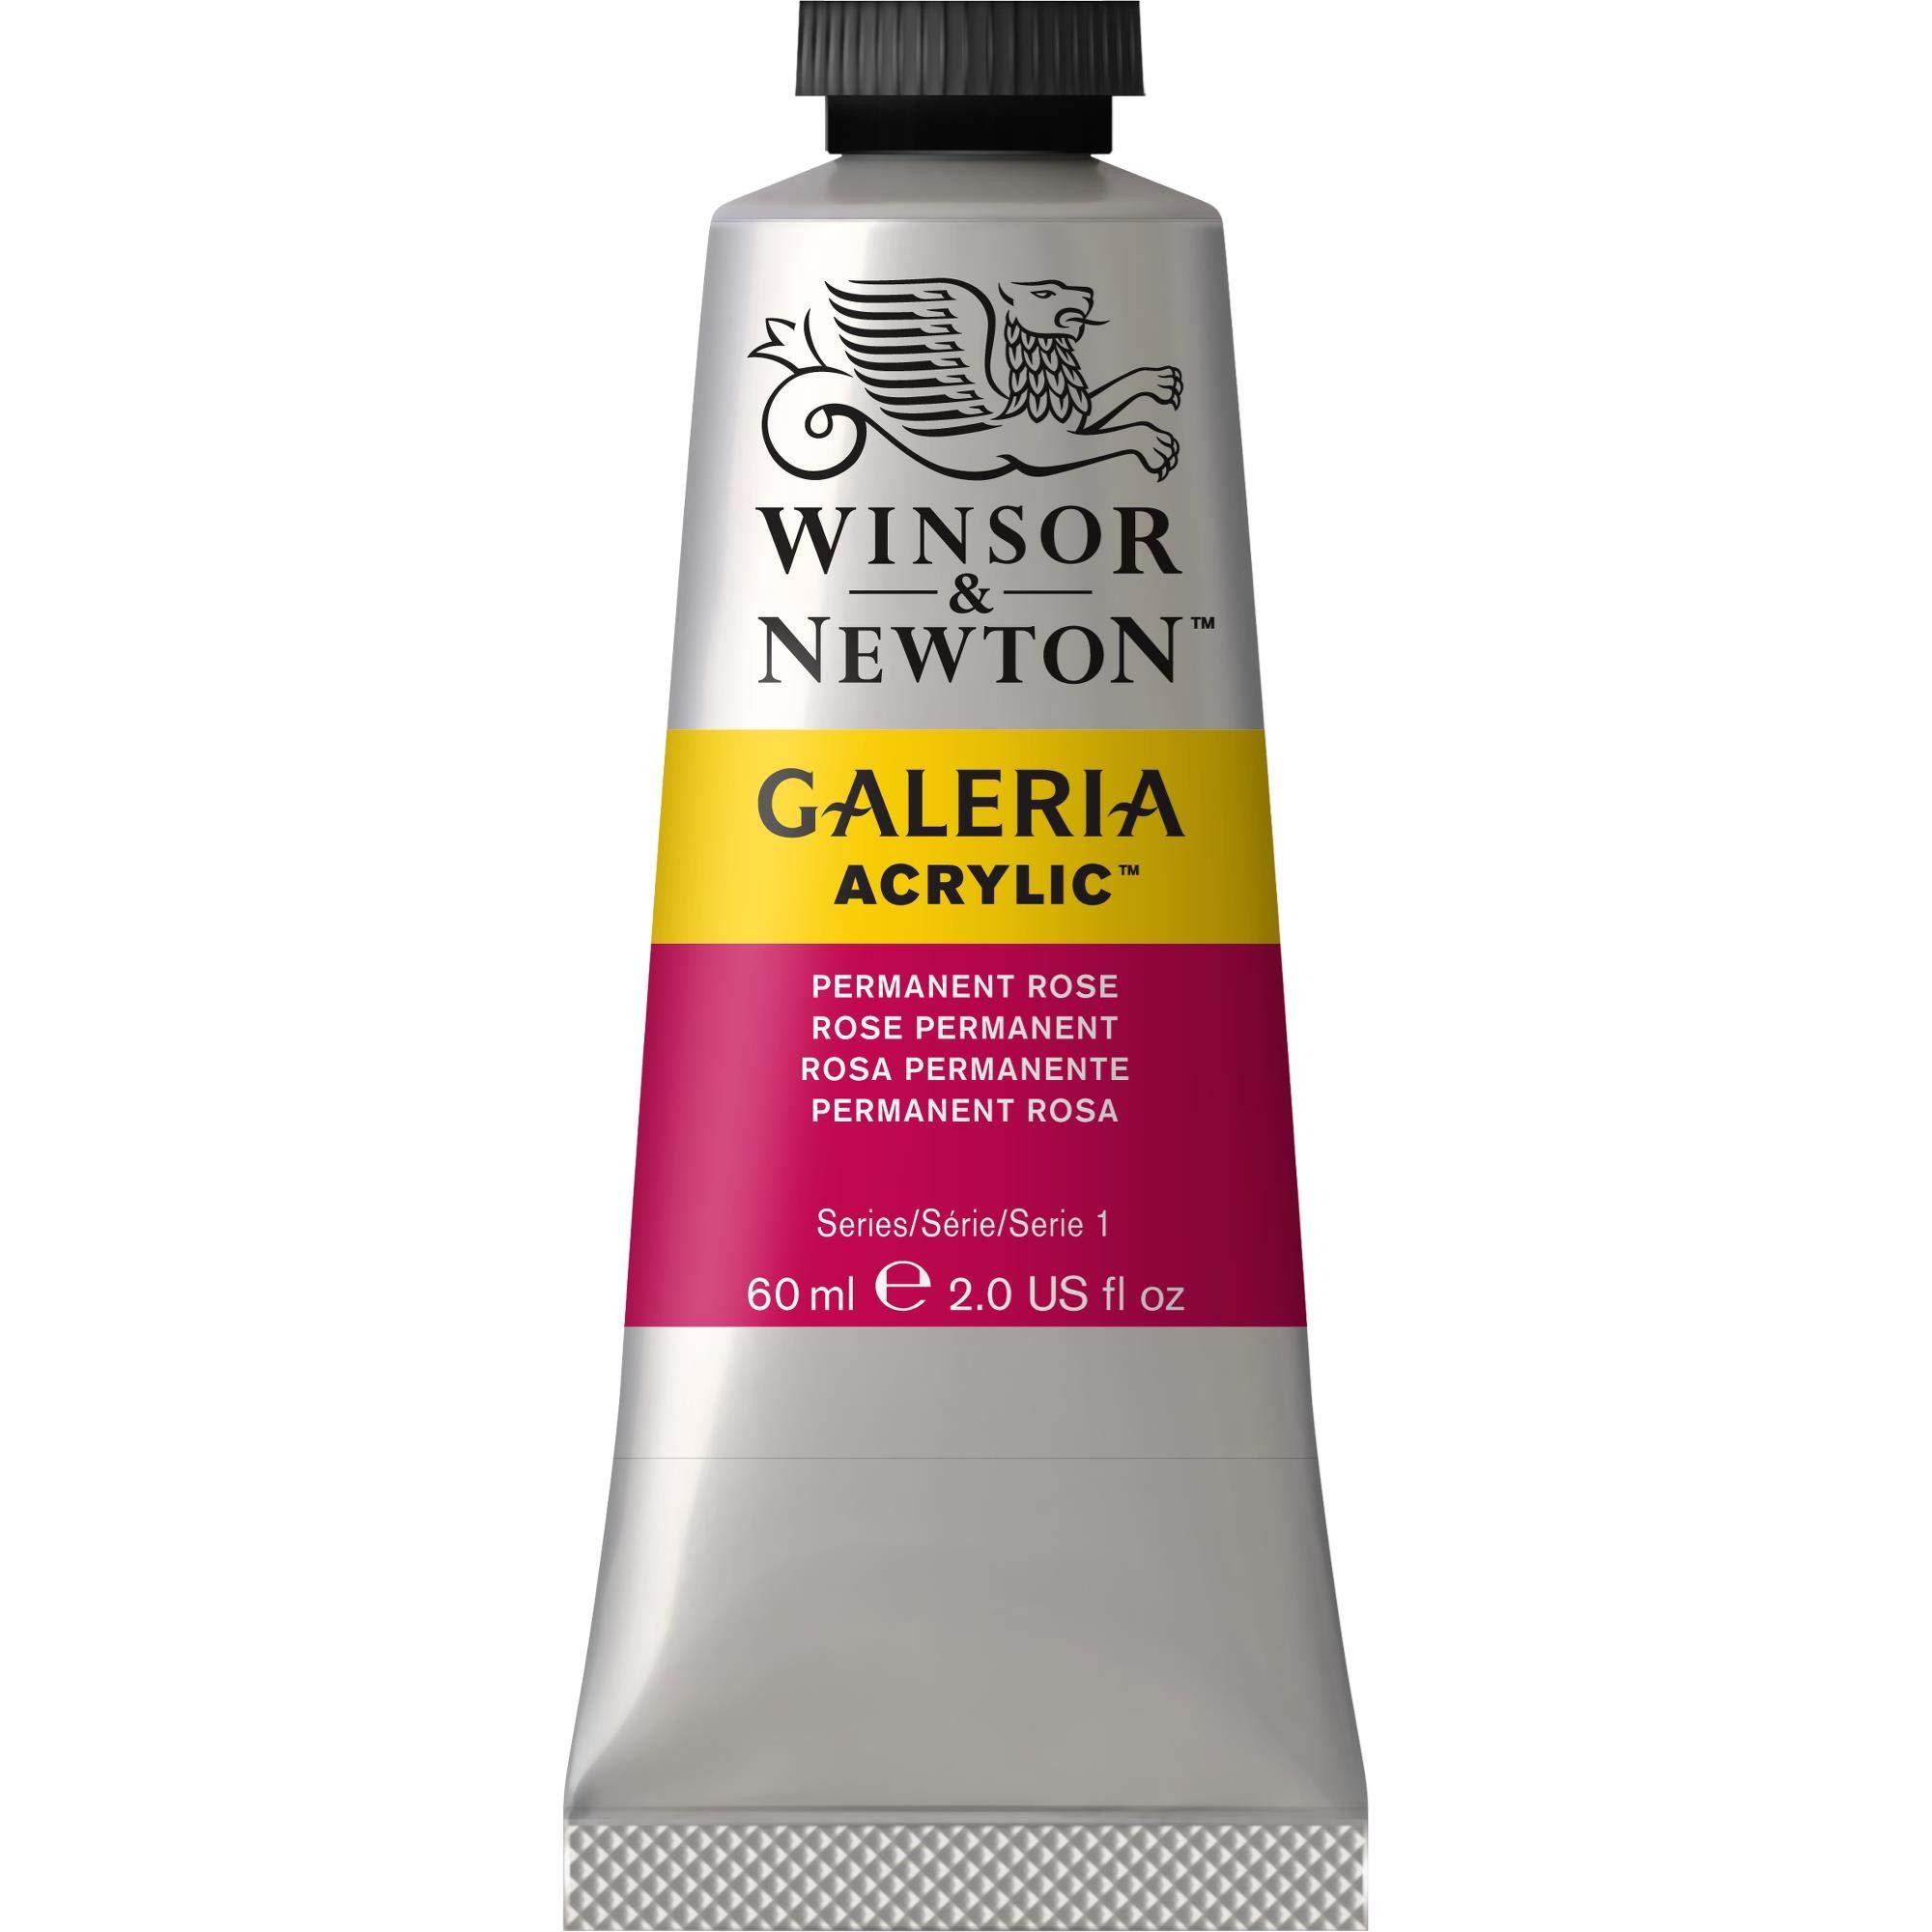 Winsor & Newton Galeria Acrylic Paint, 60ml Tube, Permanent Rose